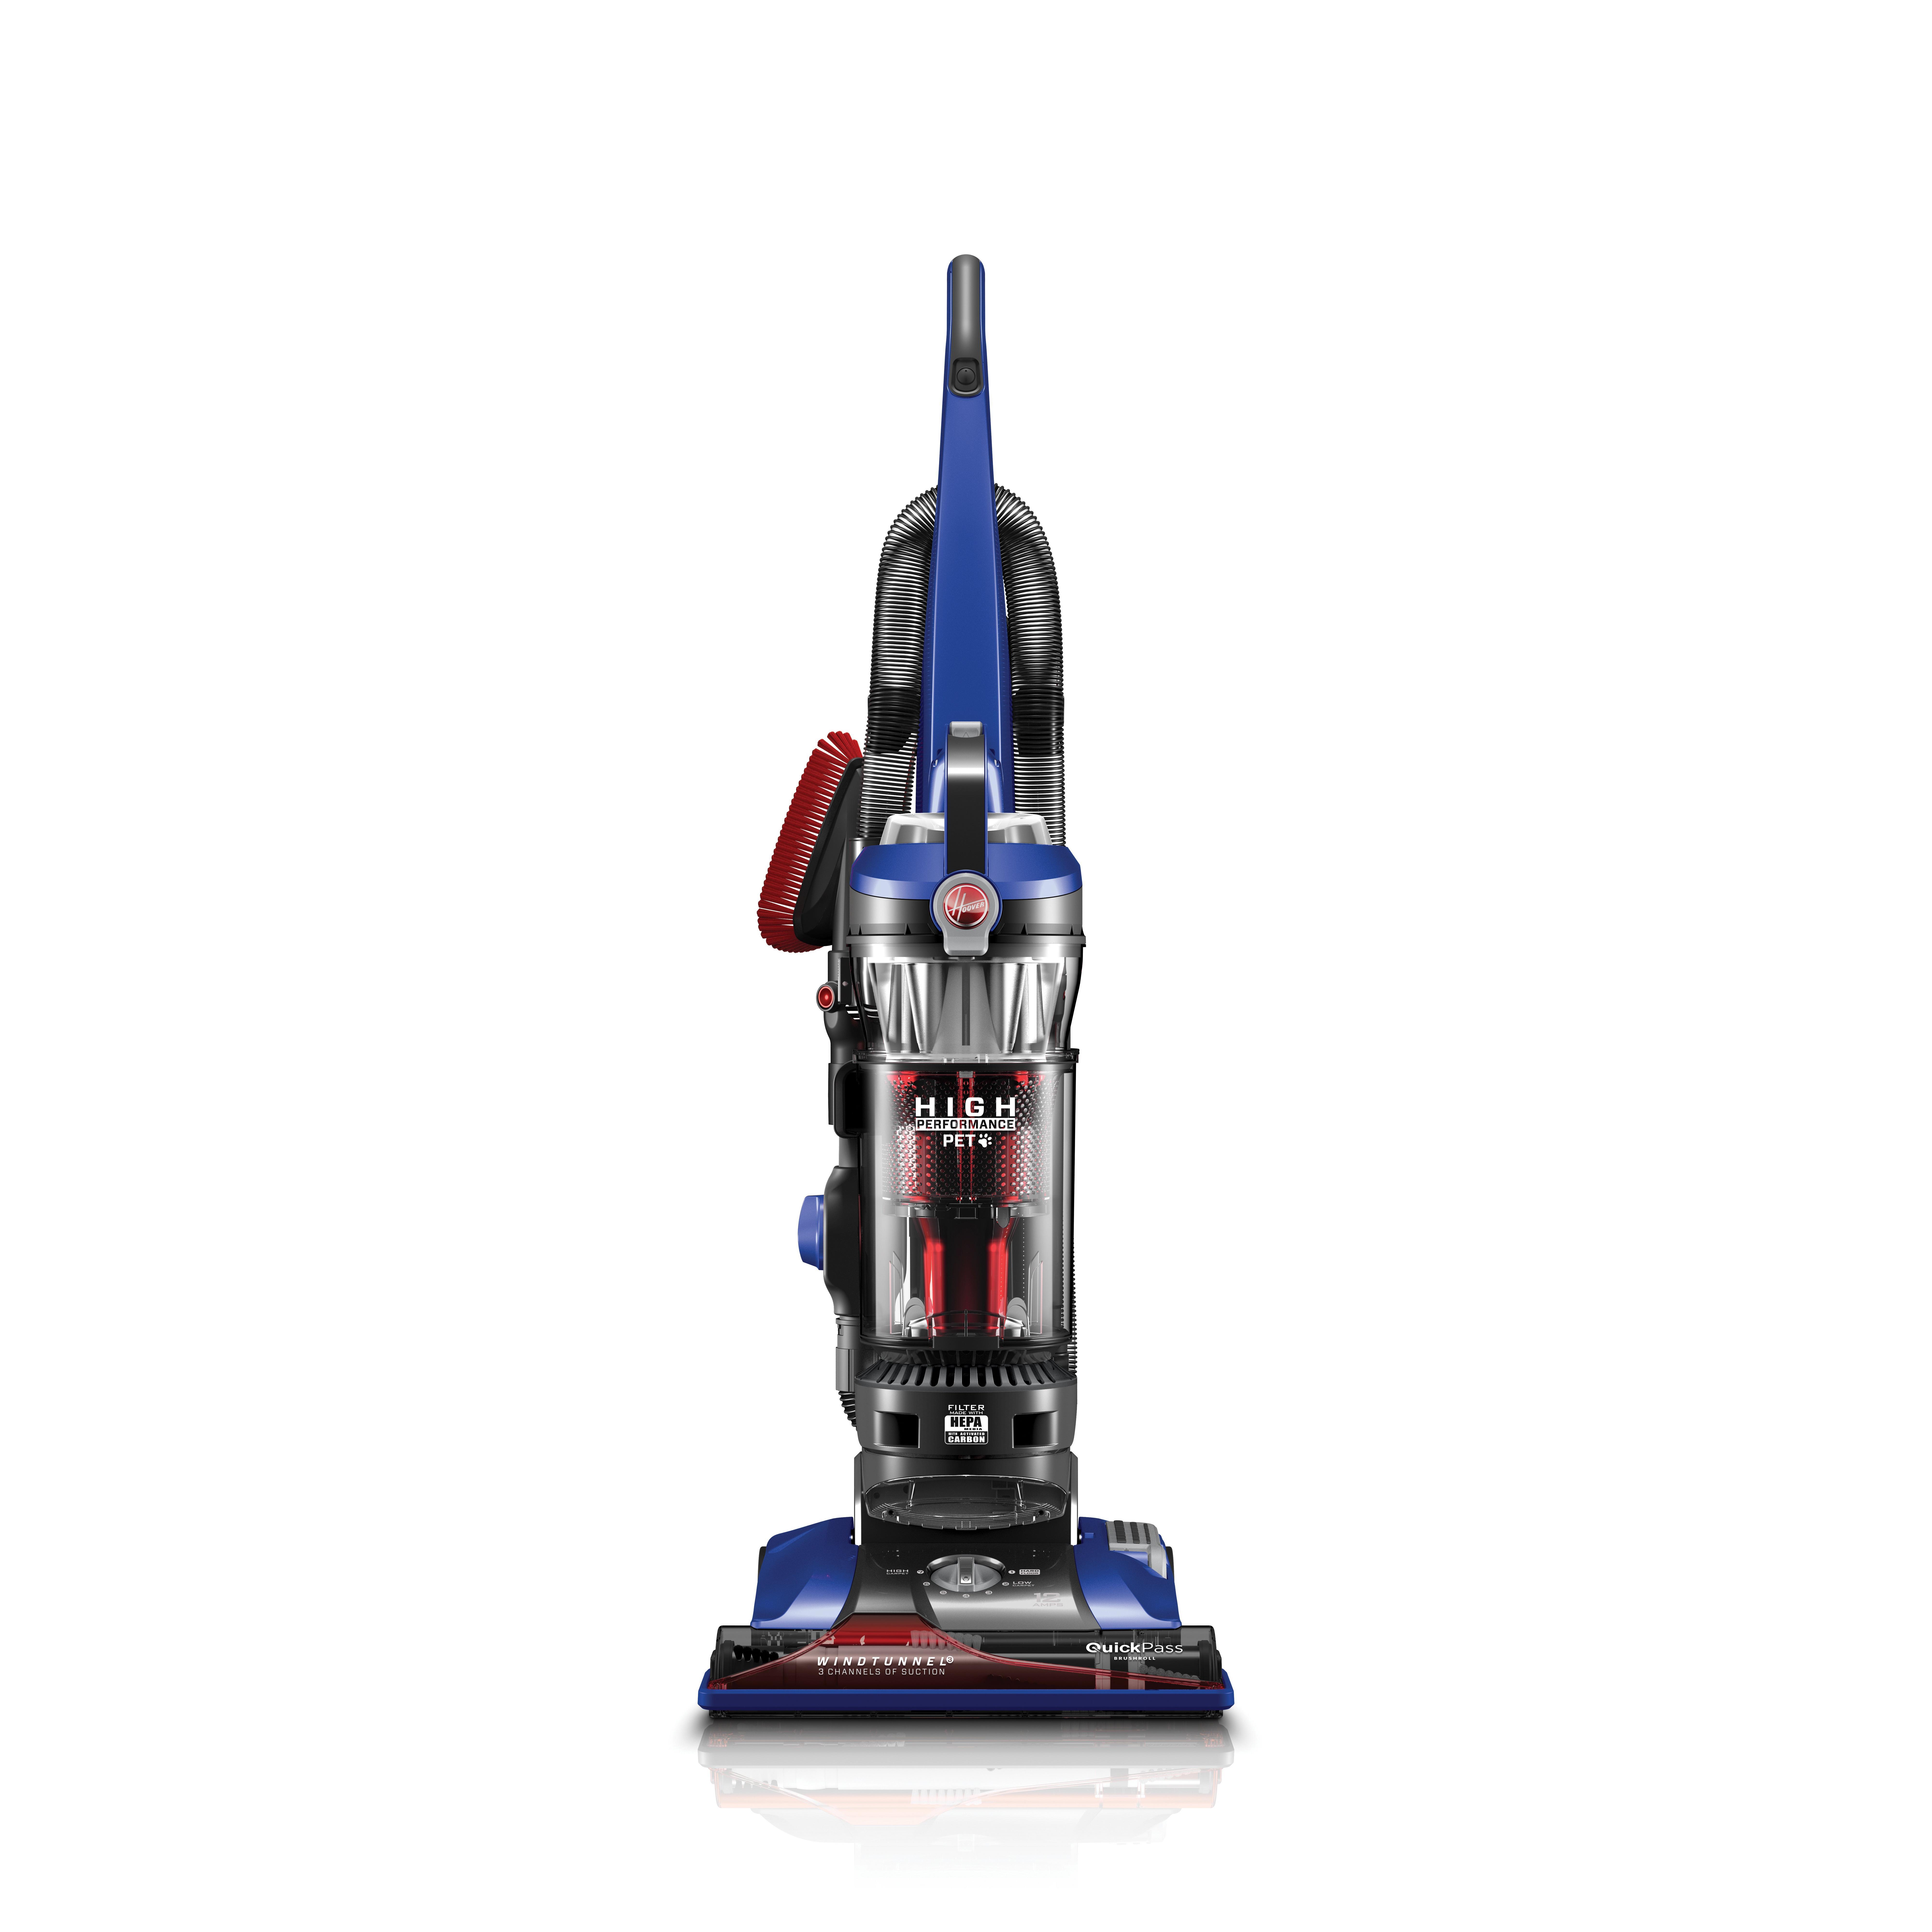 WindTunnel 3 High Performance Pet Upright Vacuum